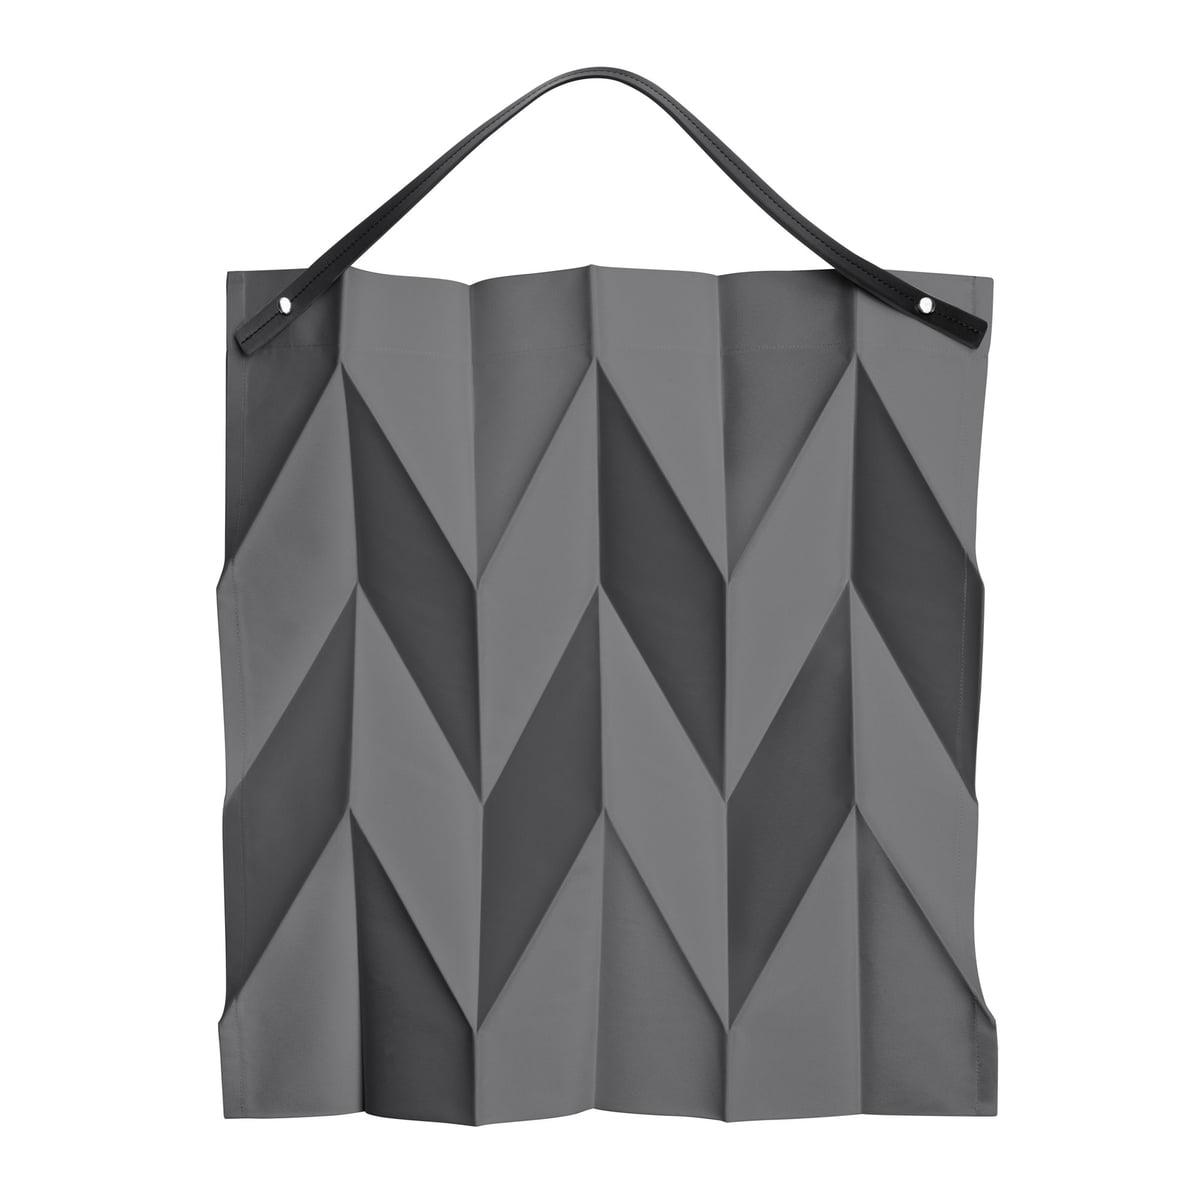 b097e0afb9 Iittala X Issey Miyake Bag in the home design shop